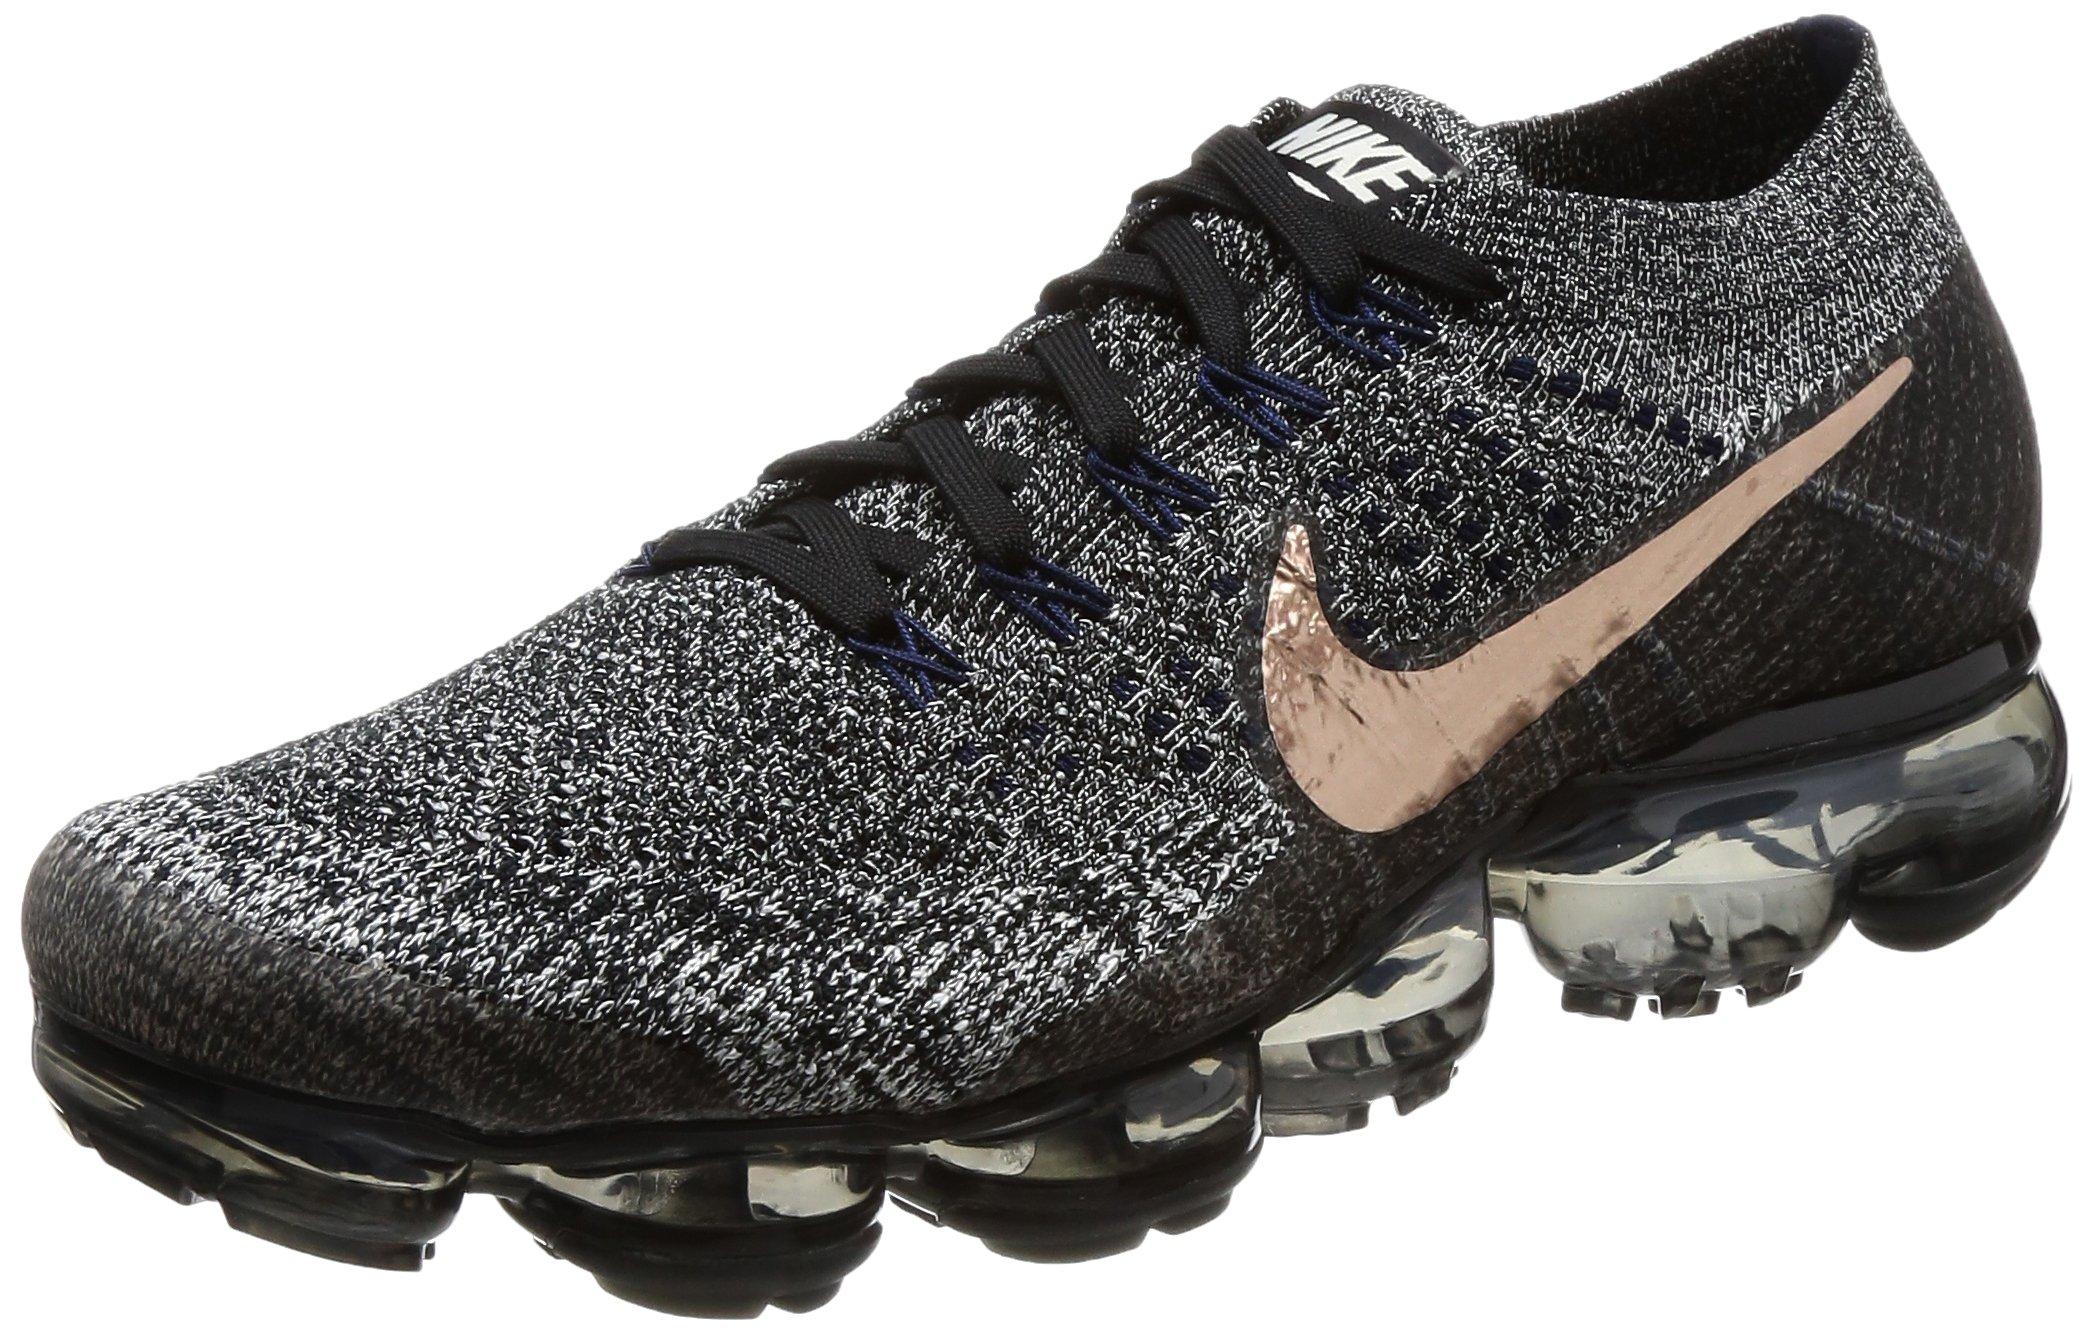 6e69b43f945 Galleon - Nike Air Vapormax Flyknit 849558 010 Black Metallic Red Bronze  Men s Shoes (9.5)